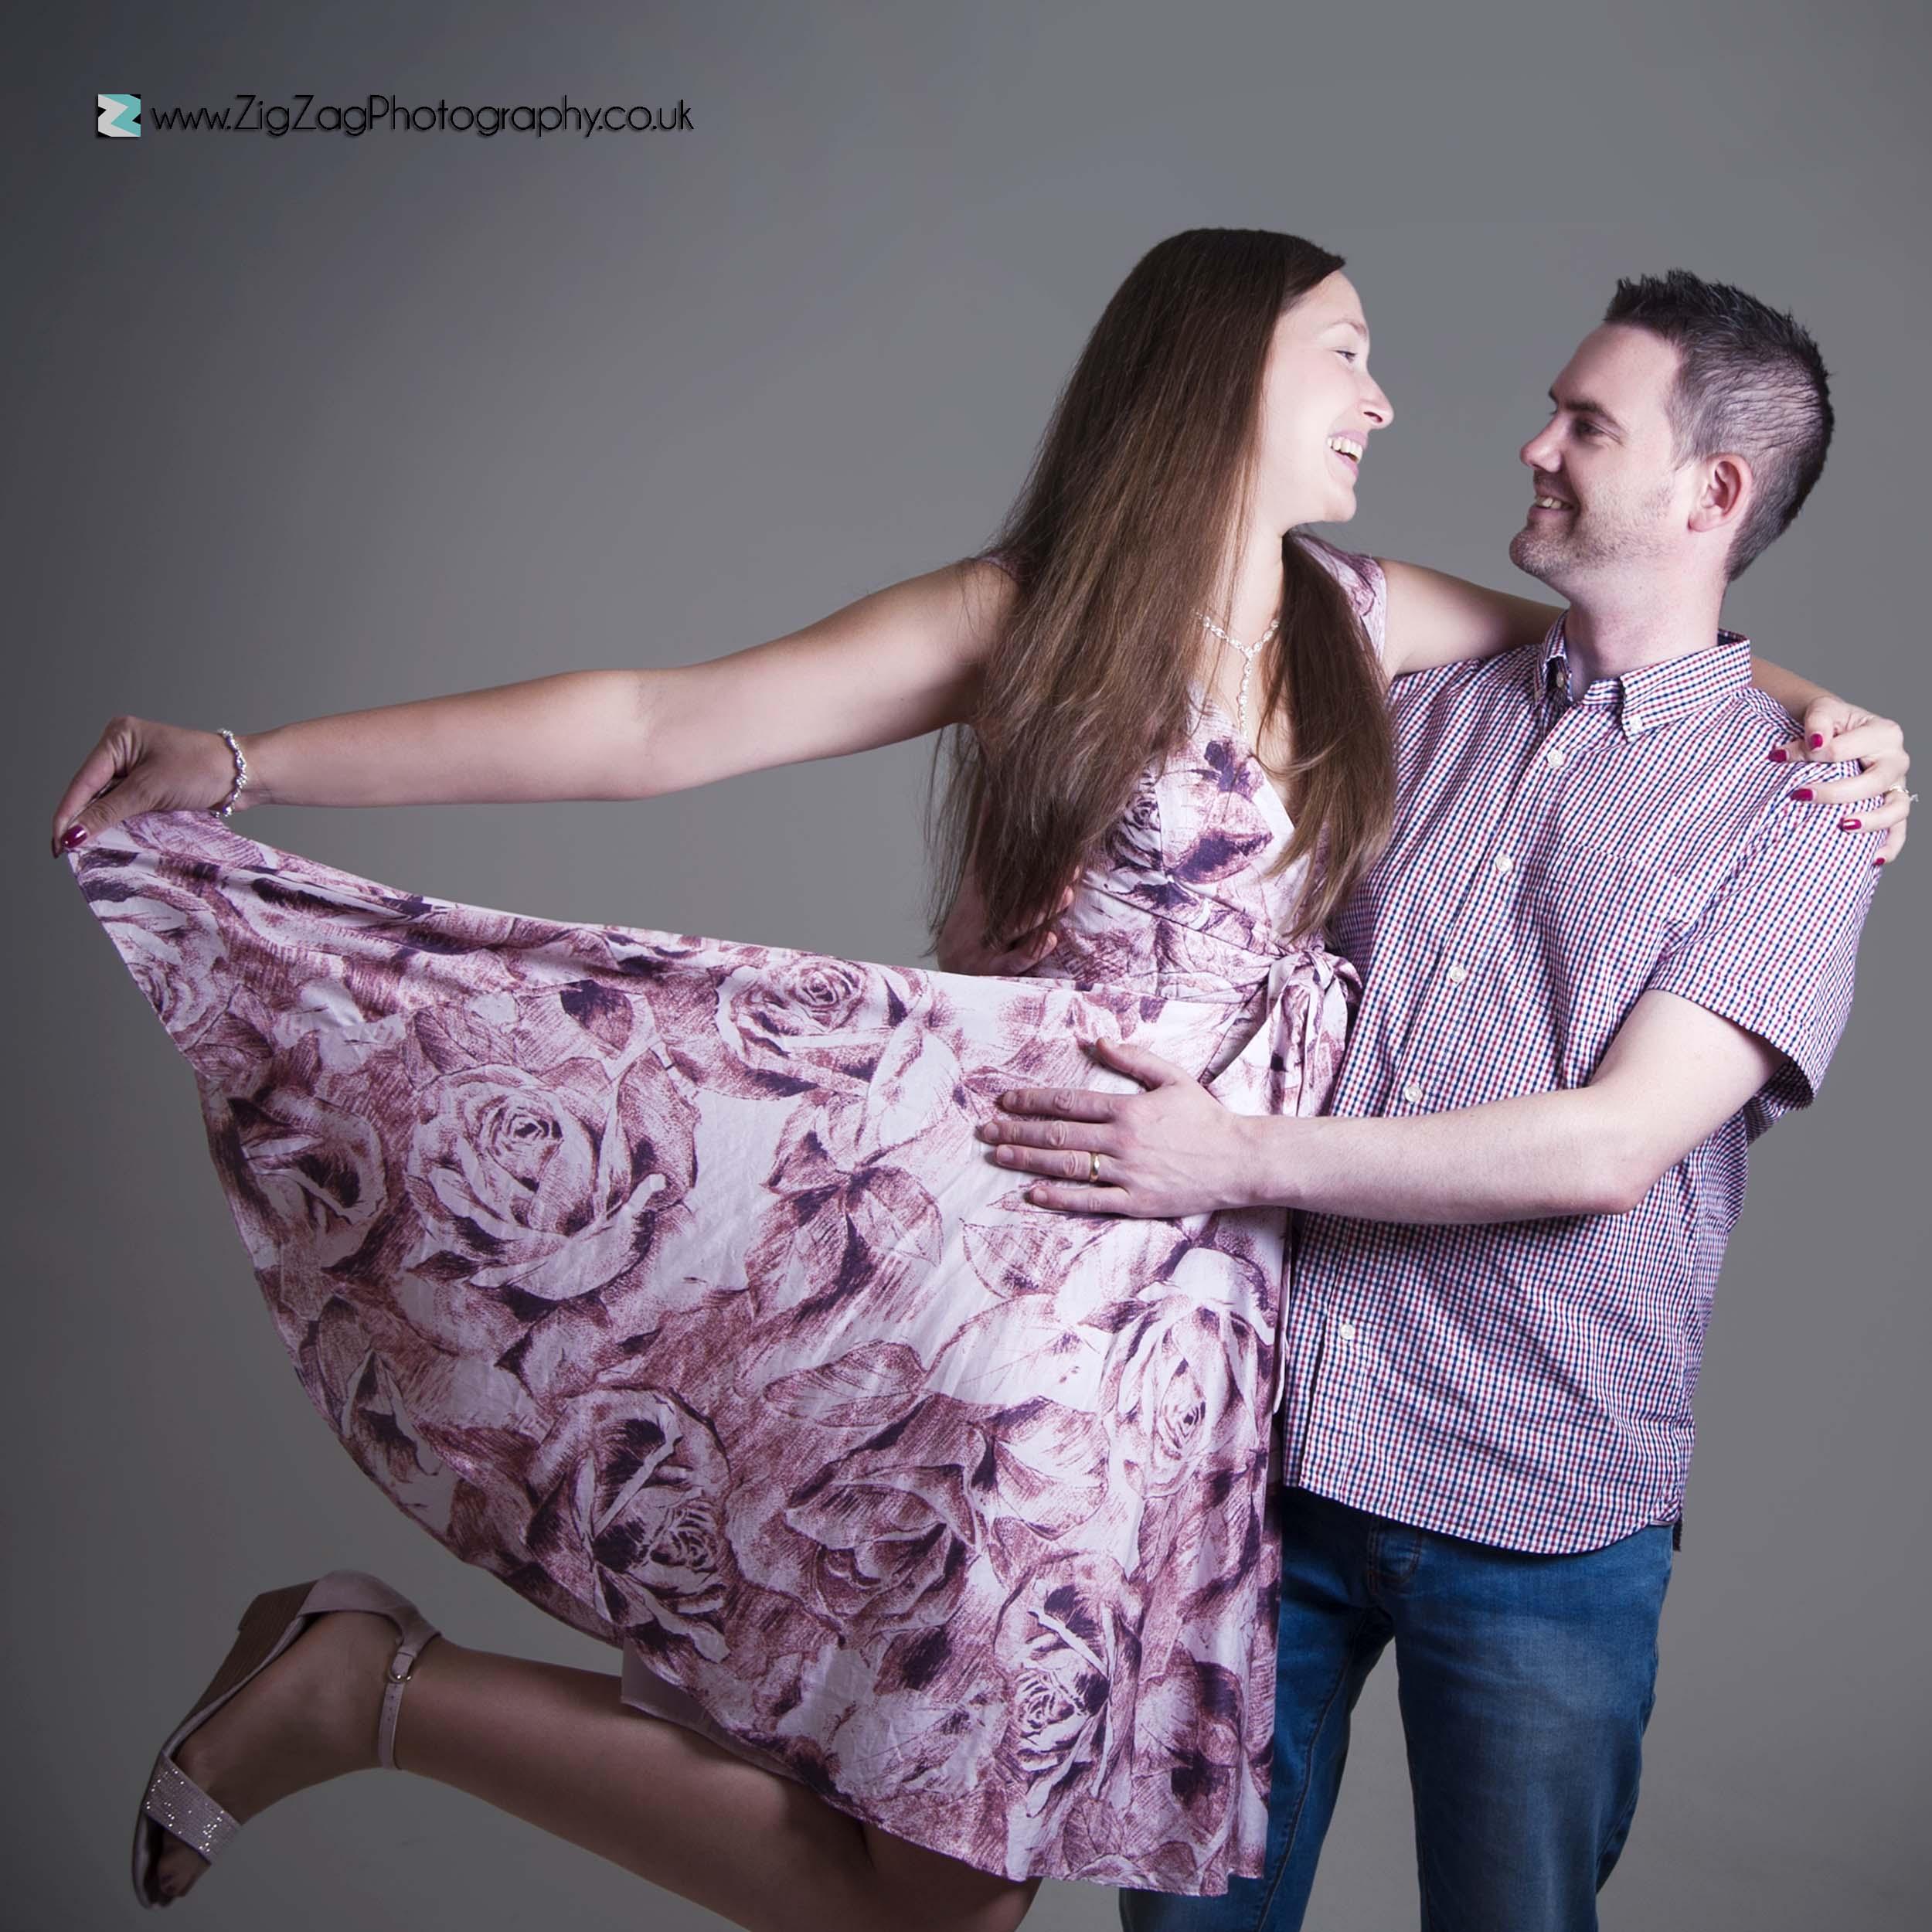 photography-session-leicester-studio-photoshoot-zigzag-dress-couple-love-romantic-happy-smiles.jpg